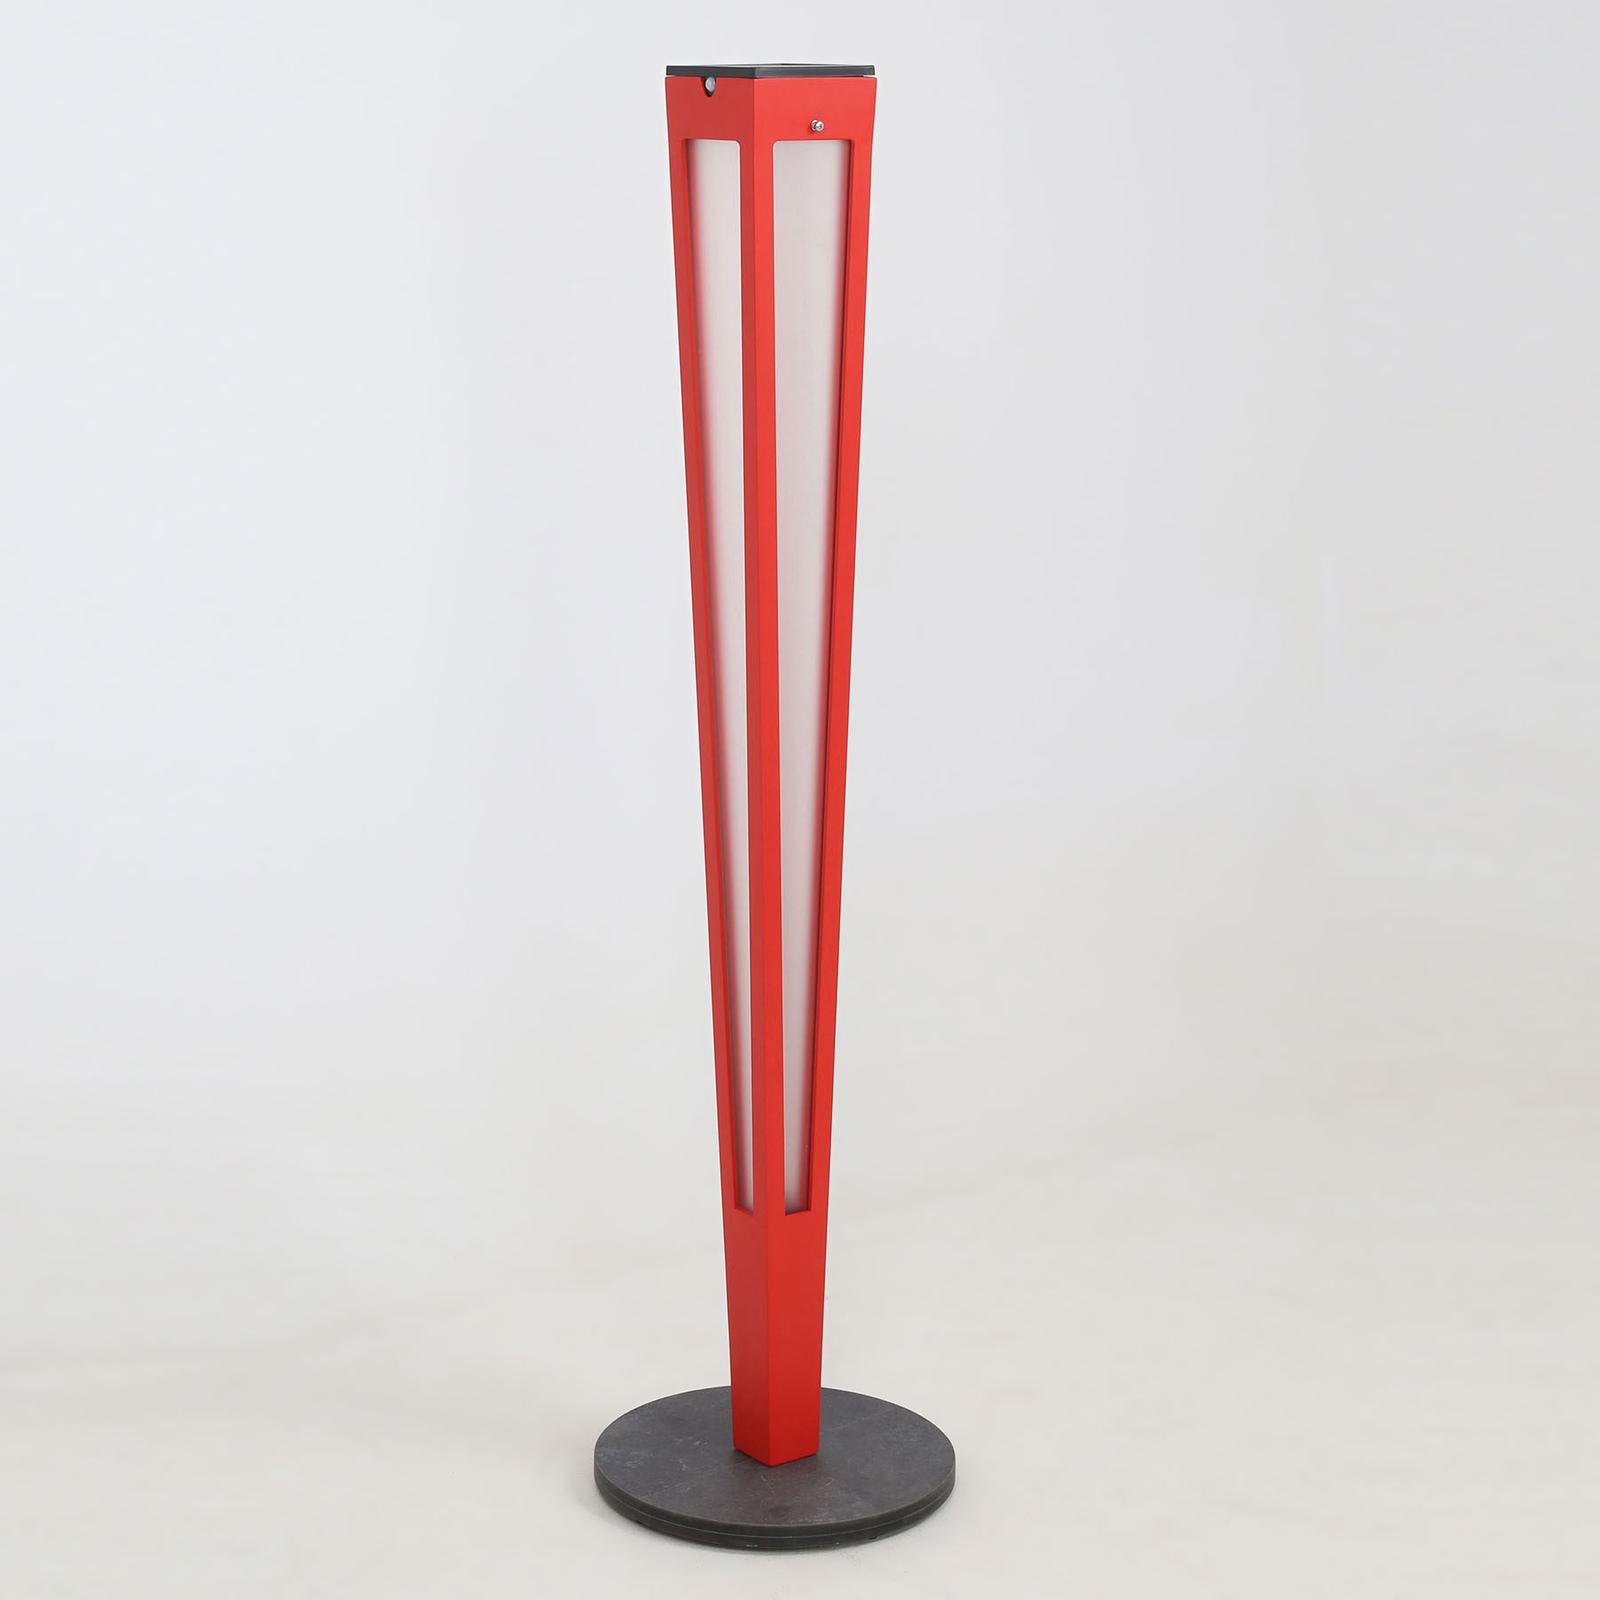 LED-solcellsfackla Tinka med sensor, 120 cm, röd